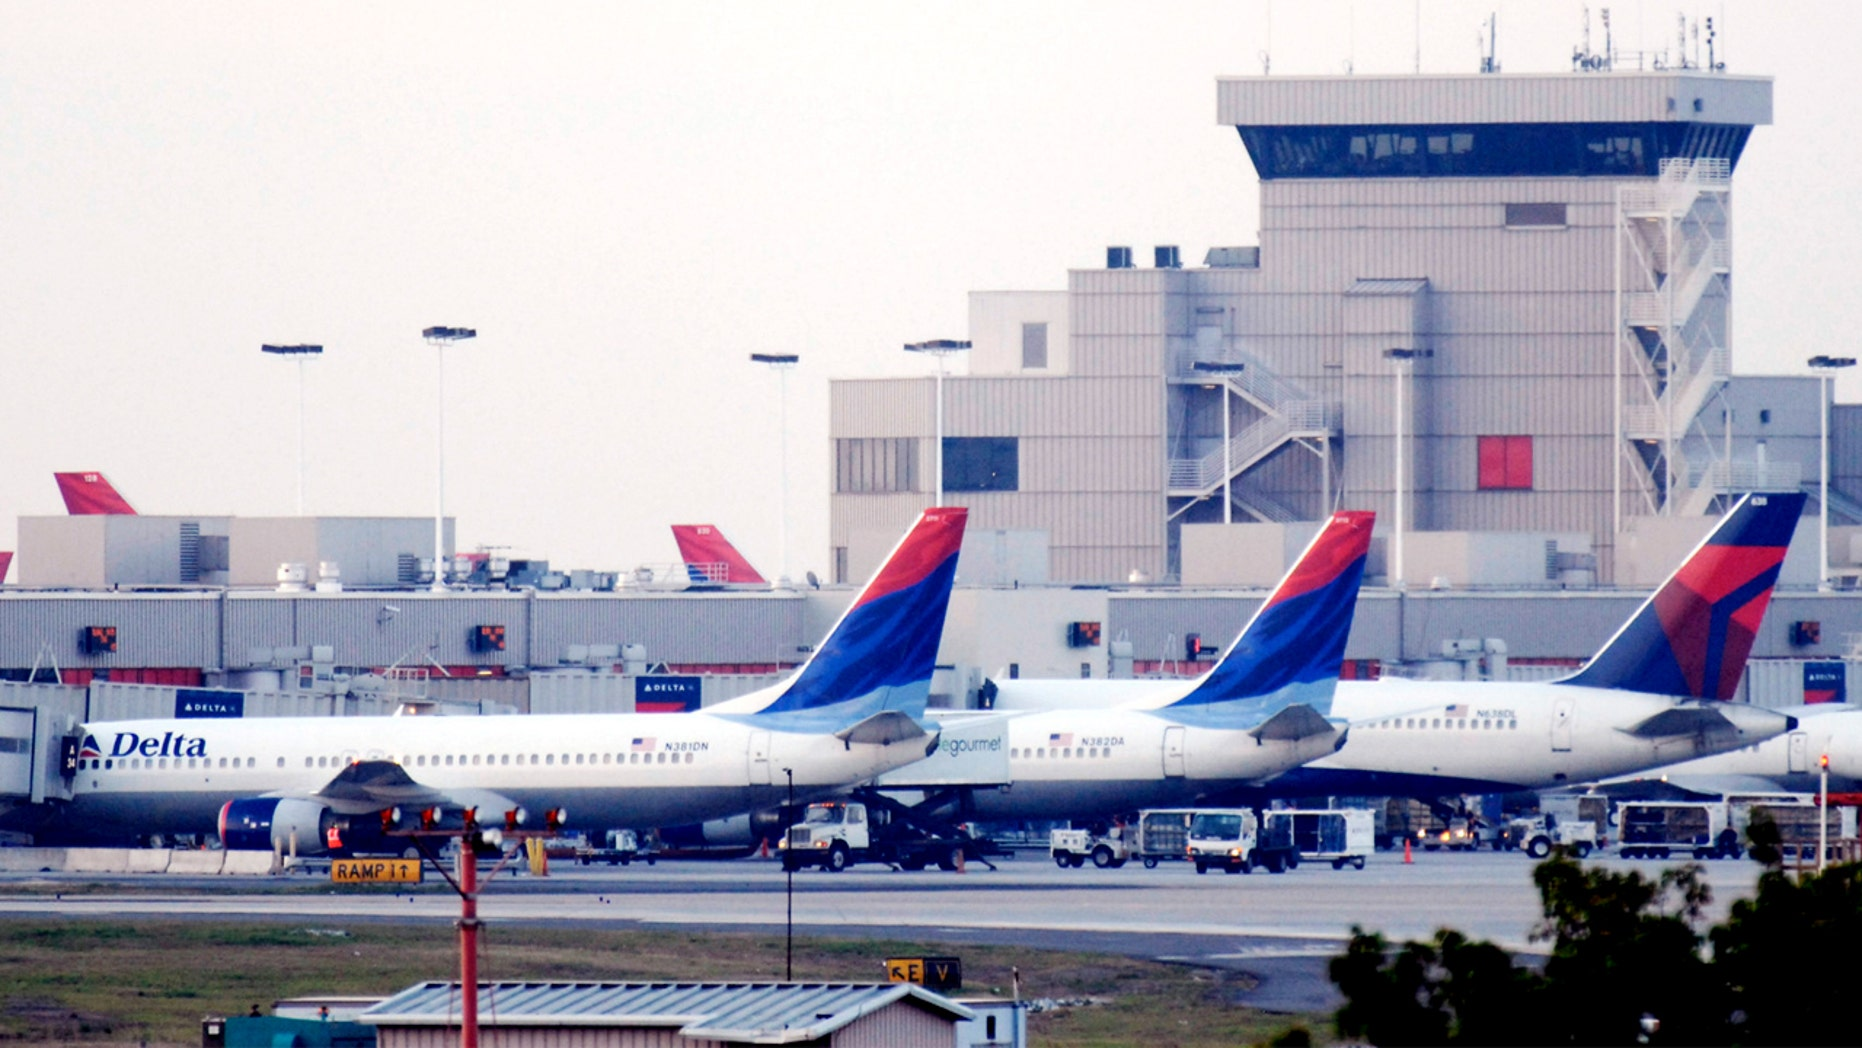 Planes At Hartsfield-Jackson International Airport in Atlanta.